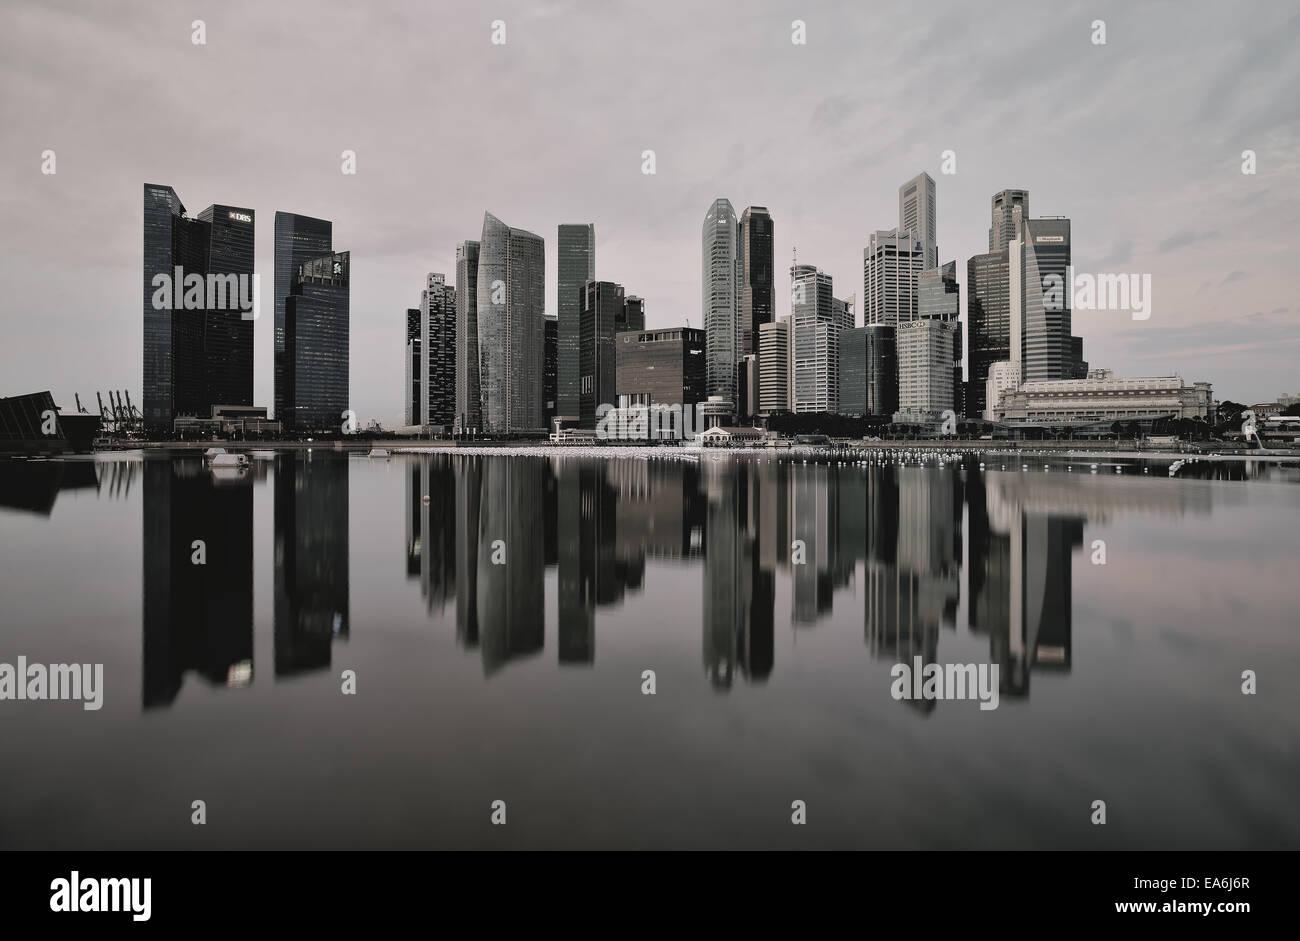 Singapore, Business district taken from Marina Bay waterfront promenade - Stock Image